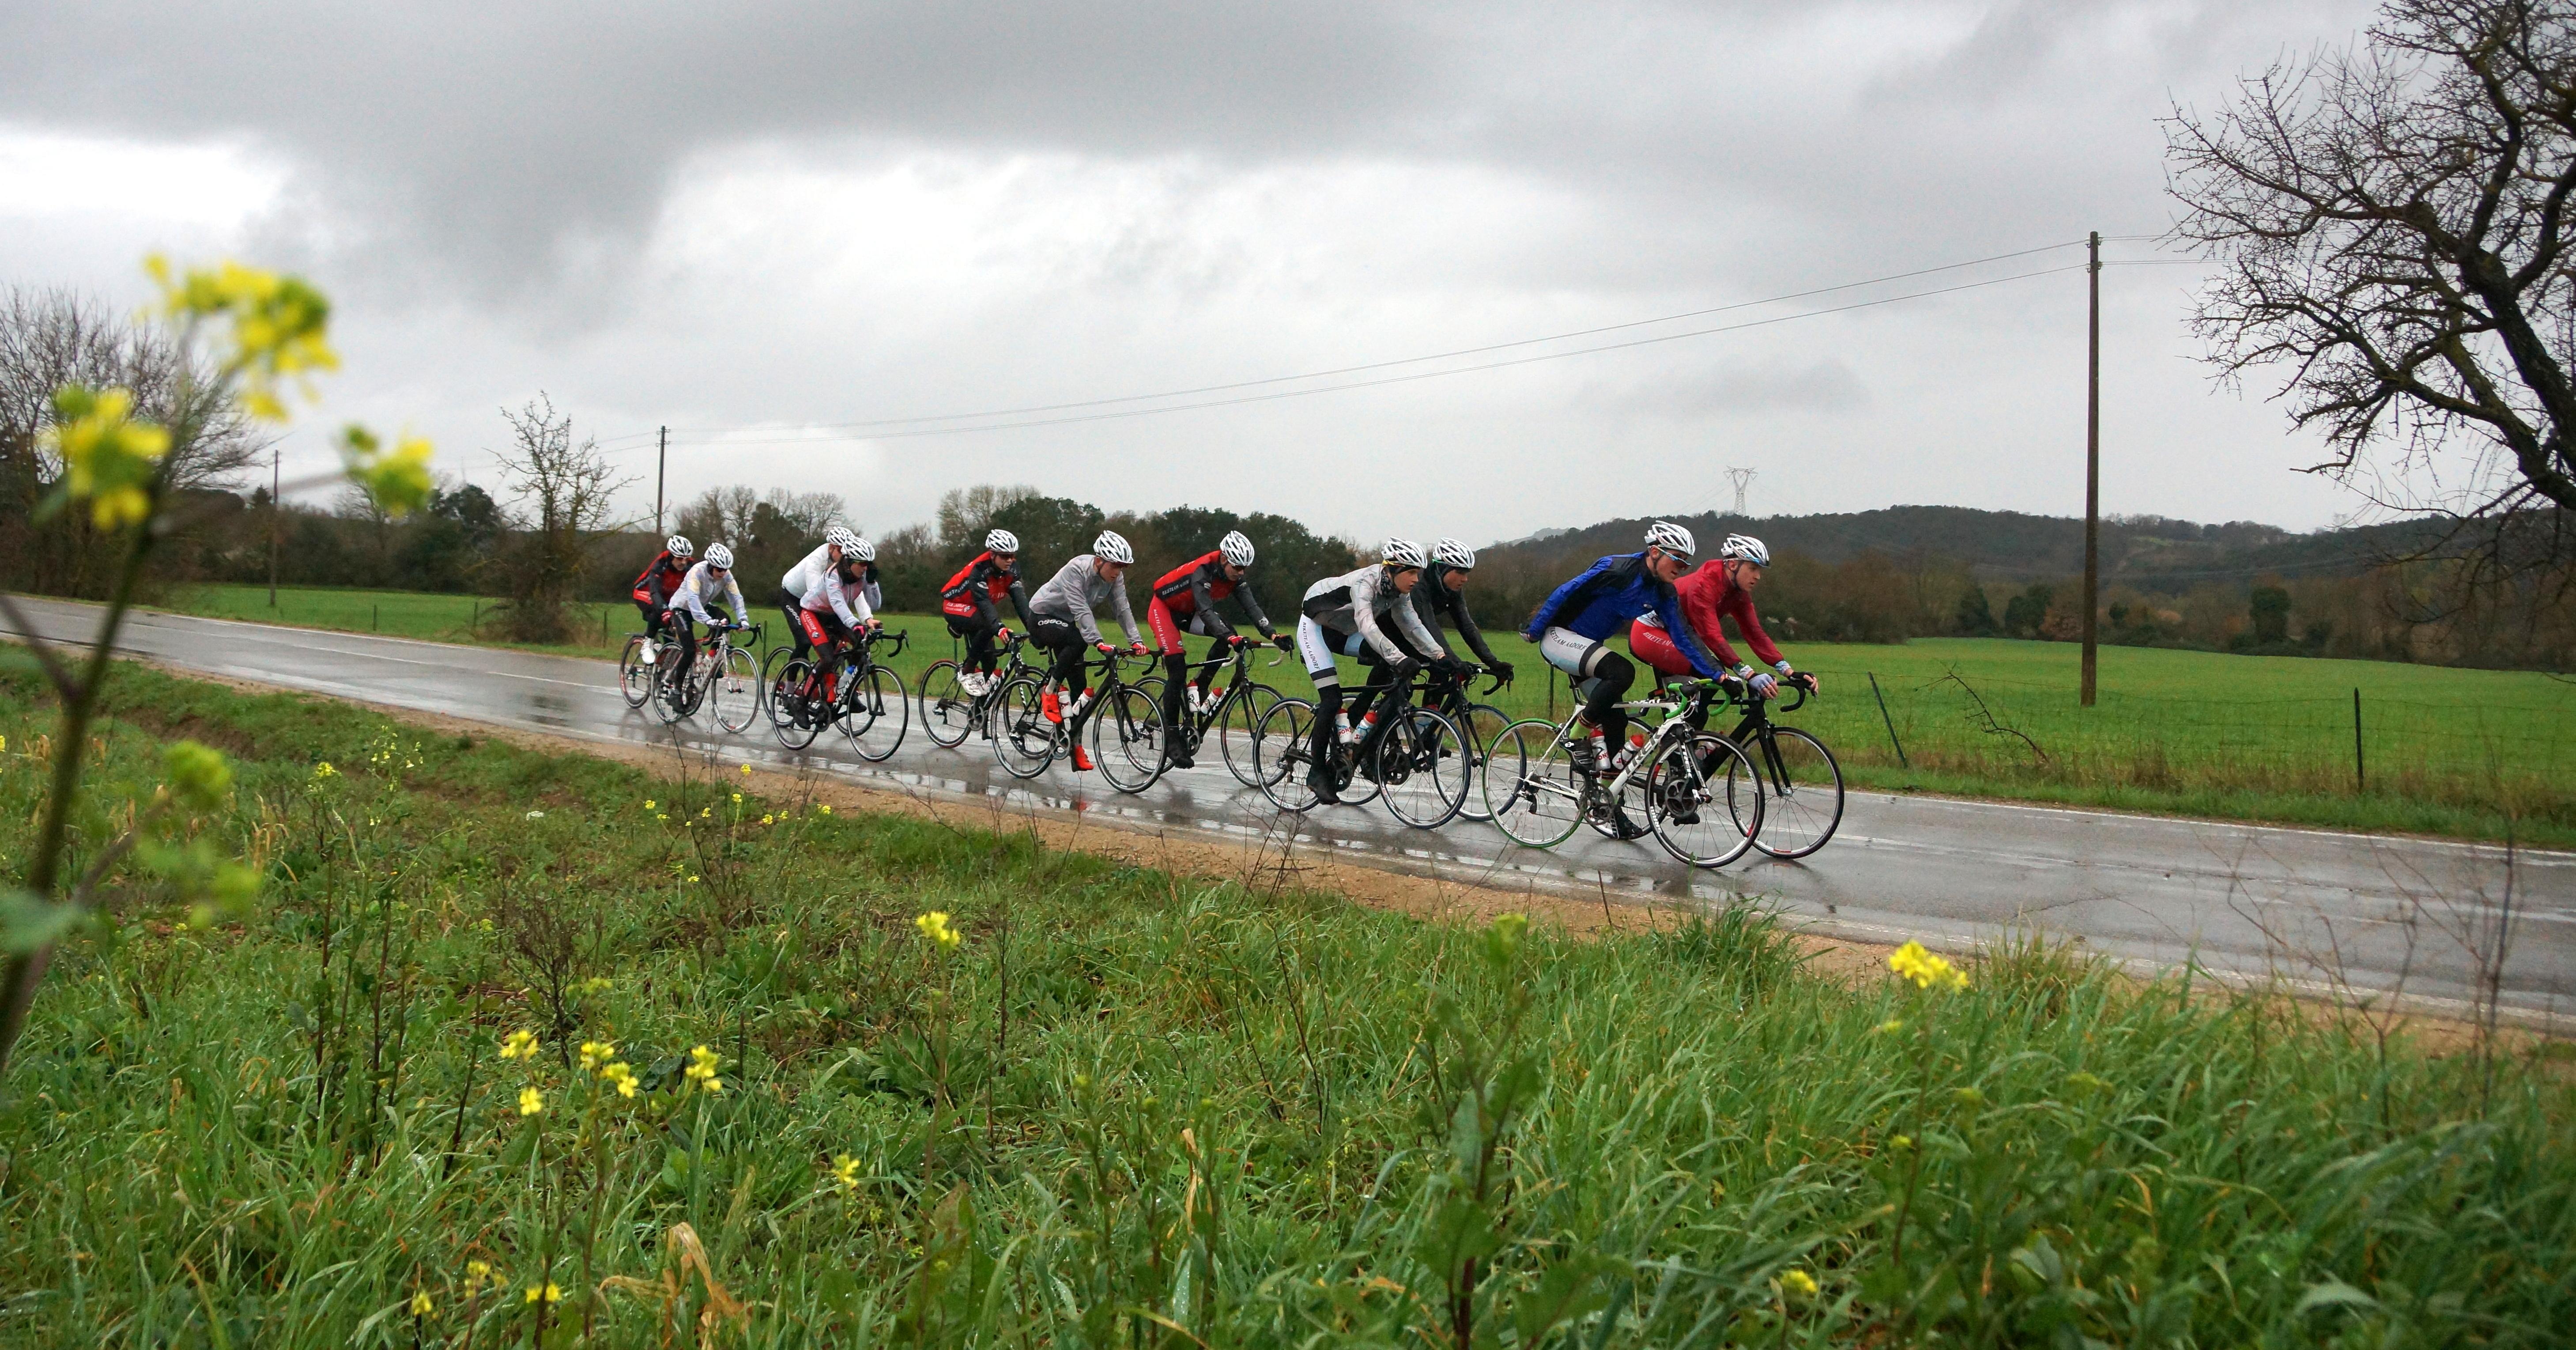 Team Raiffeisen Aadorf-Elgg auf Trainingsfahrt